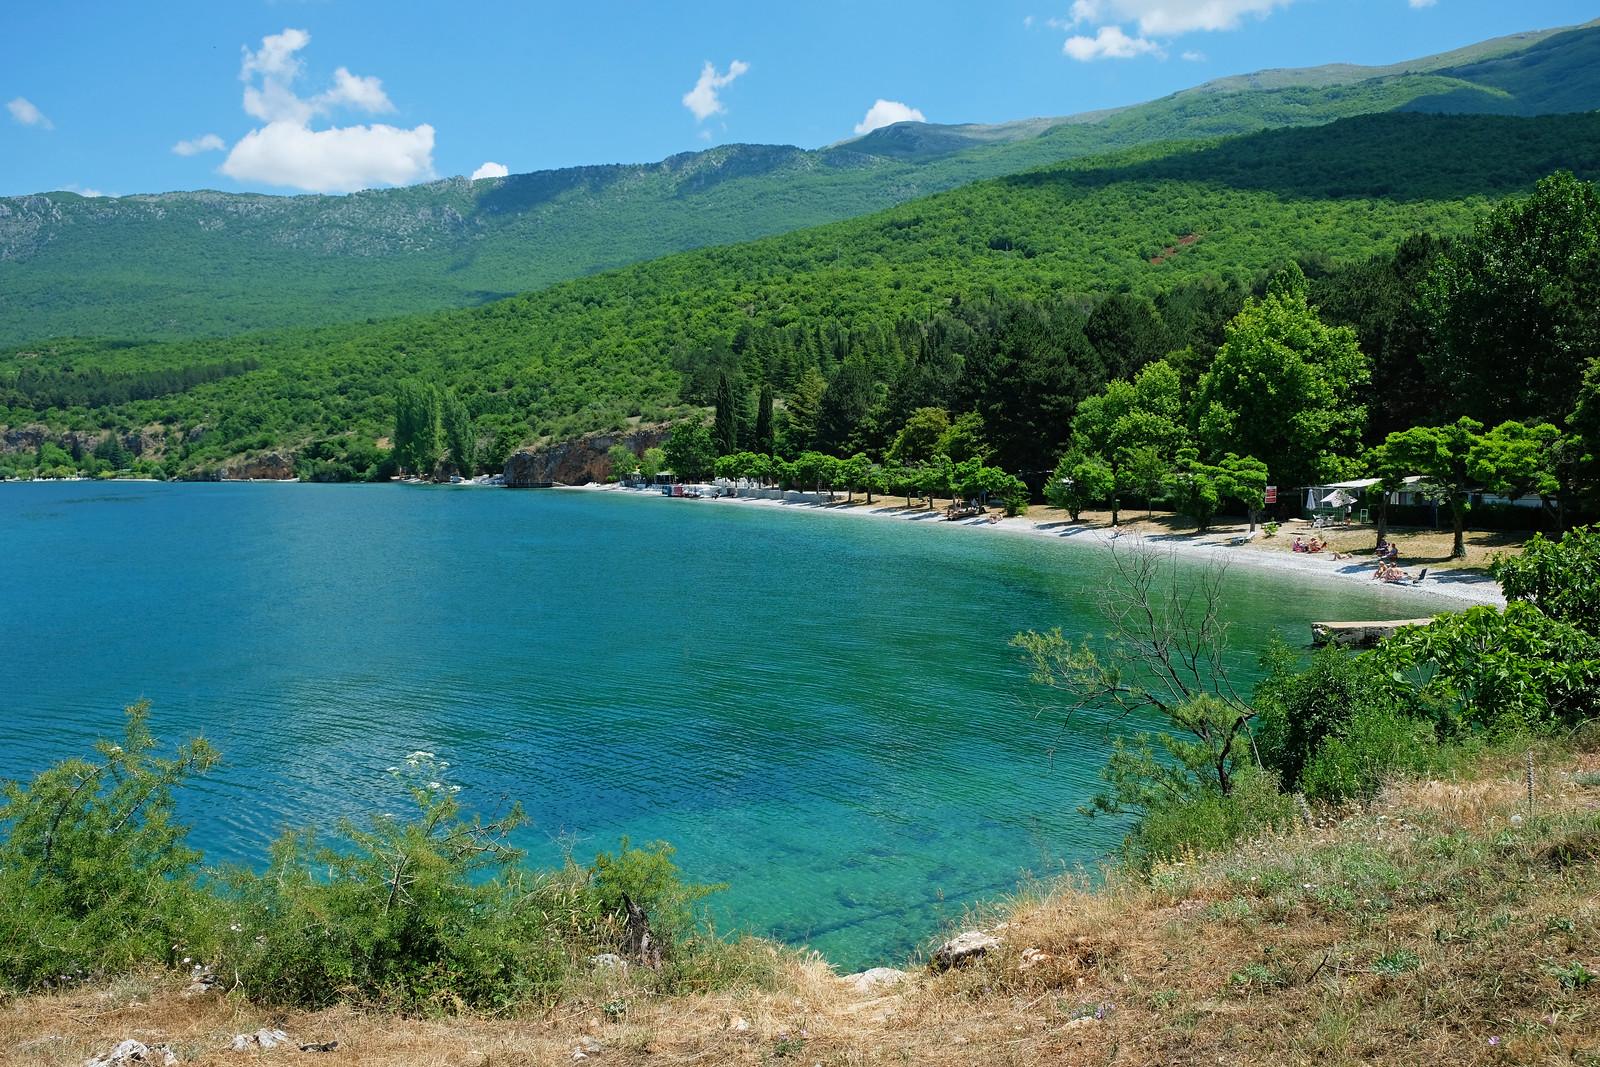 Gradishte beach, North Macedonia